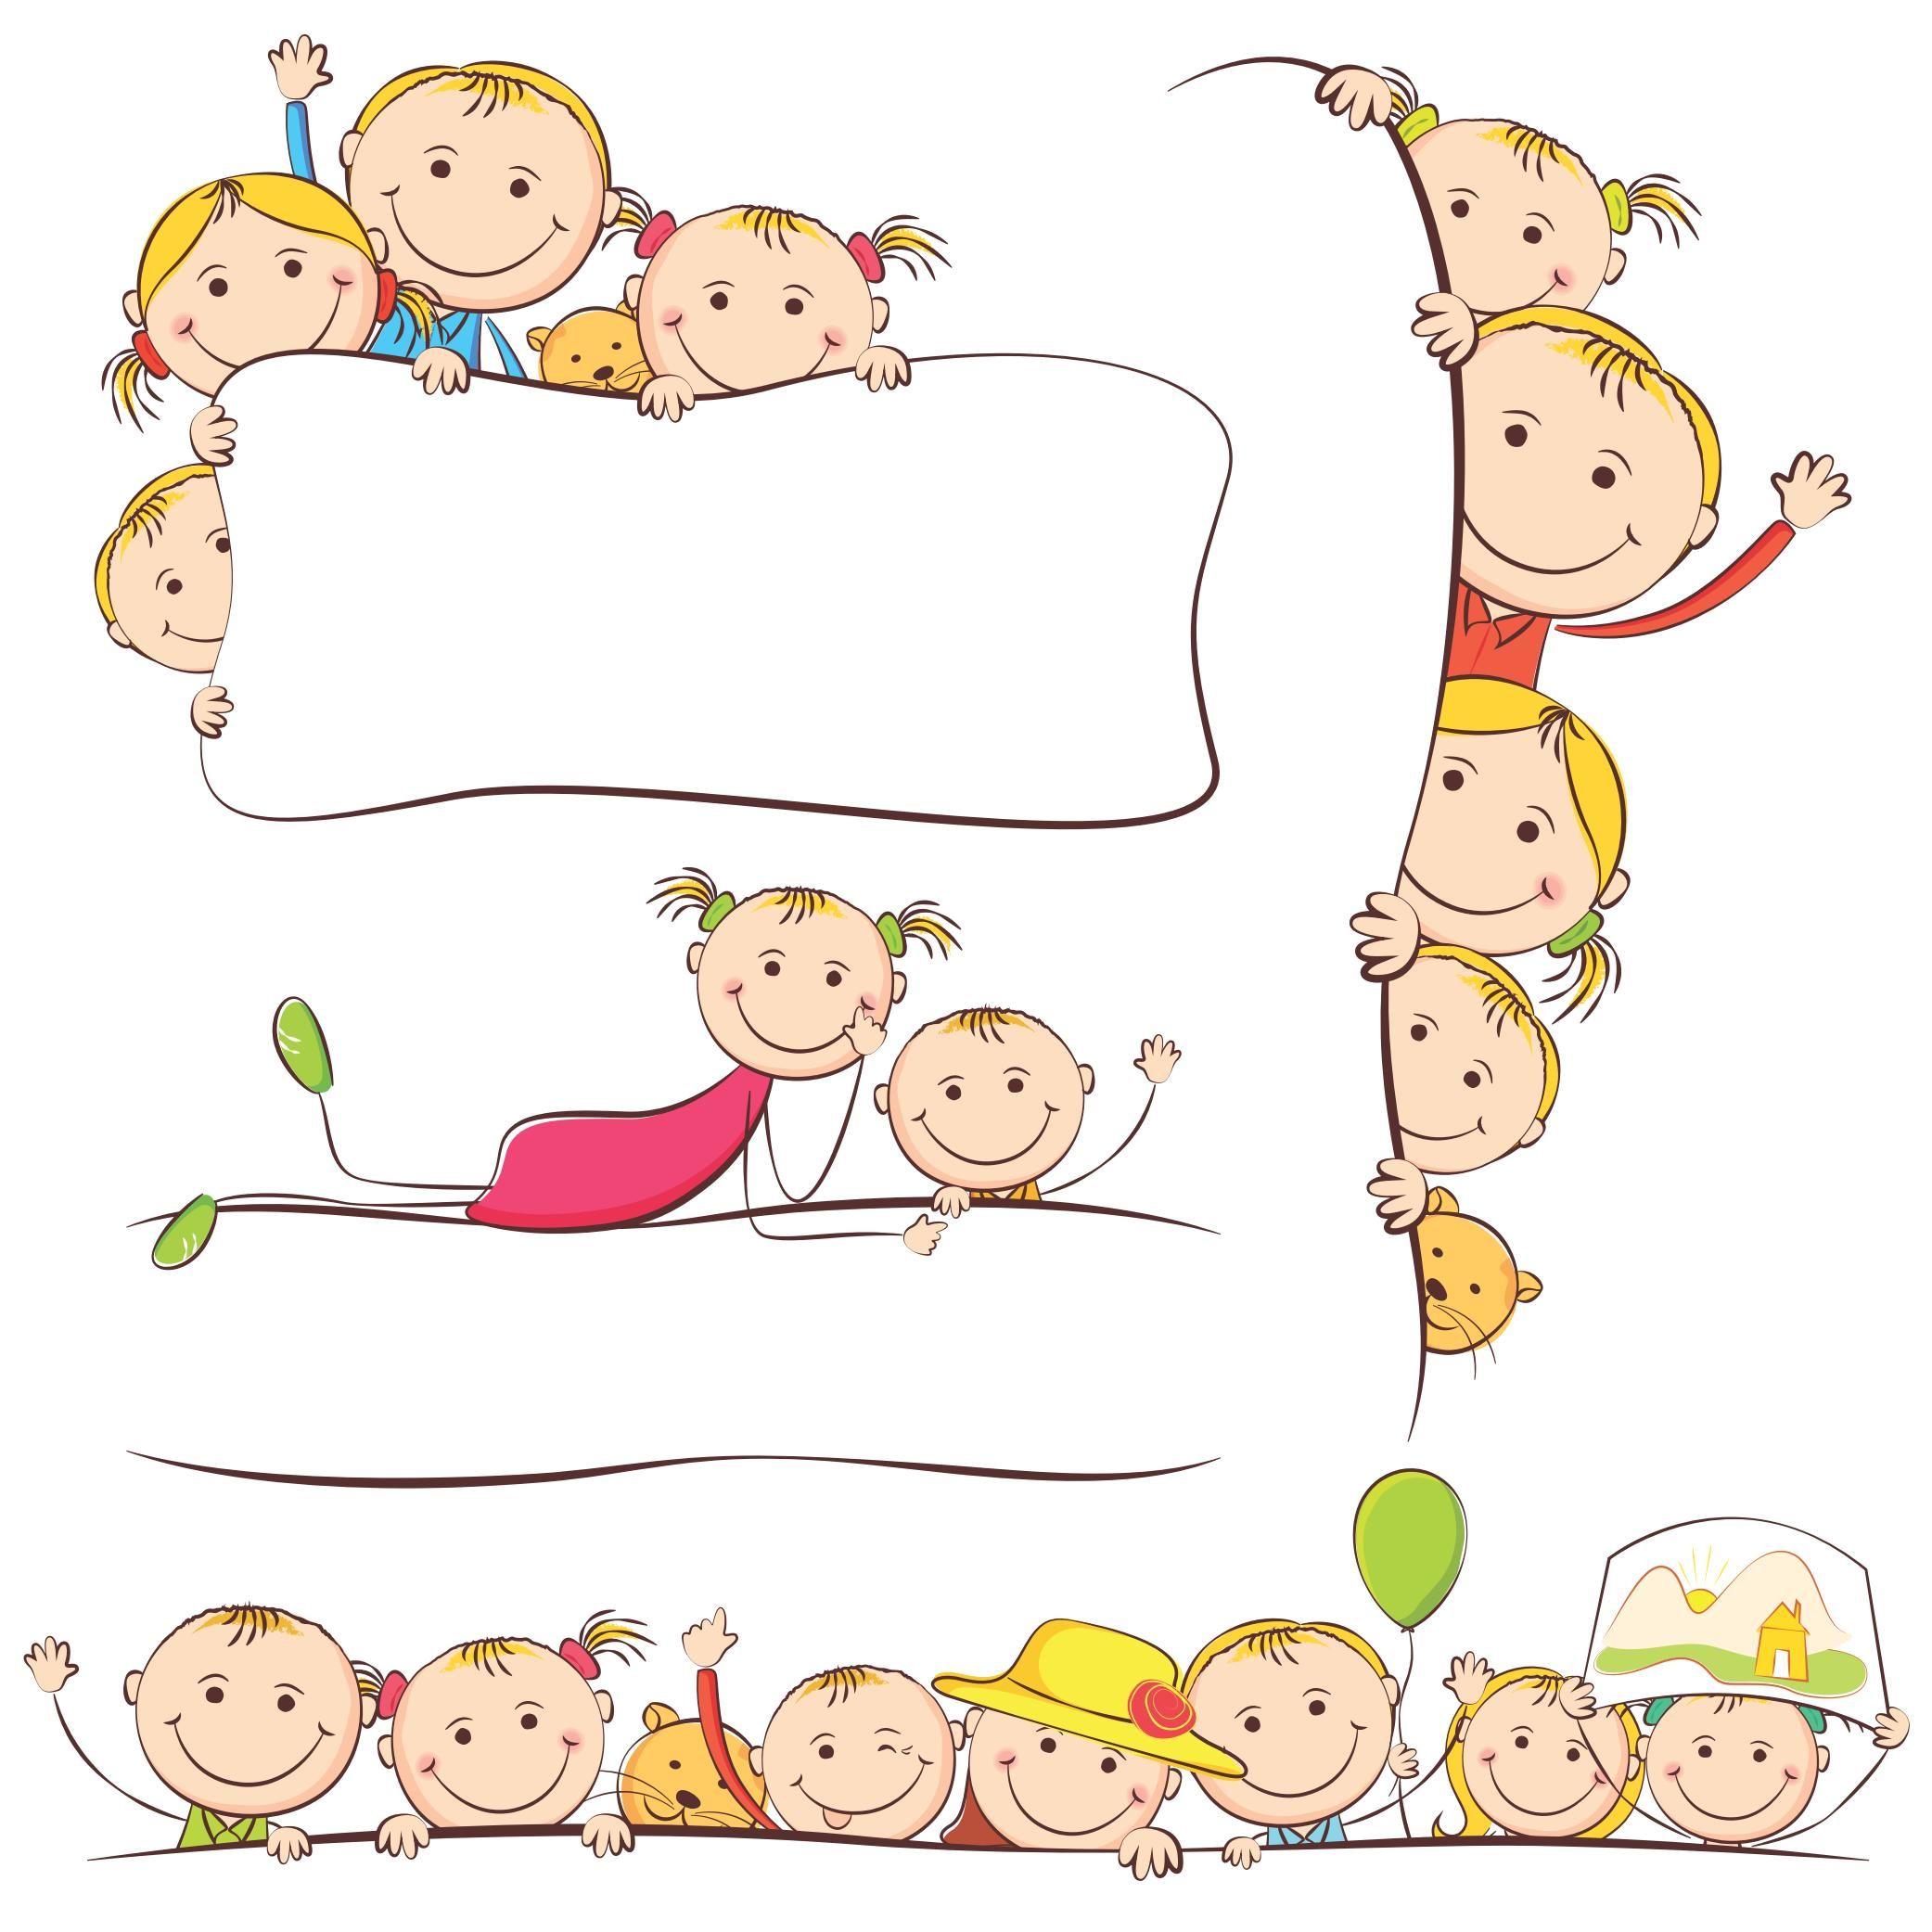 cartoon children kids people 05 - Cartoon Drawings For Kids Free